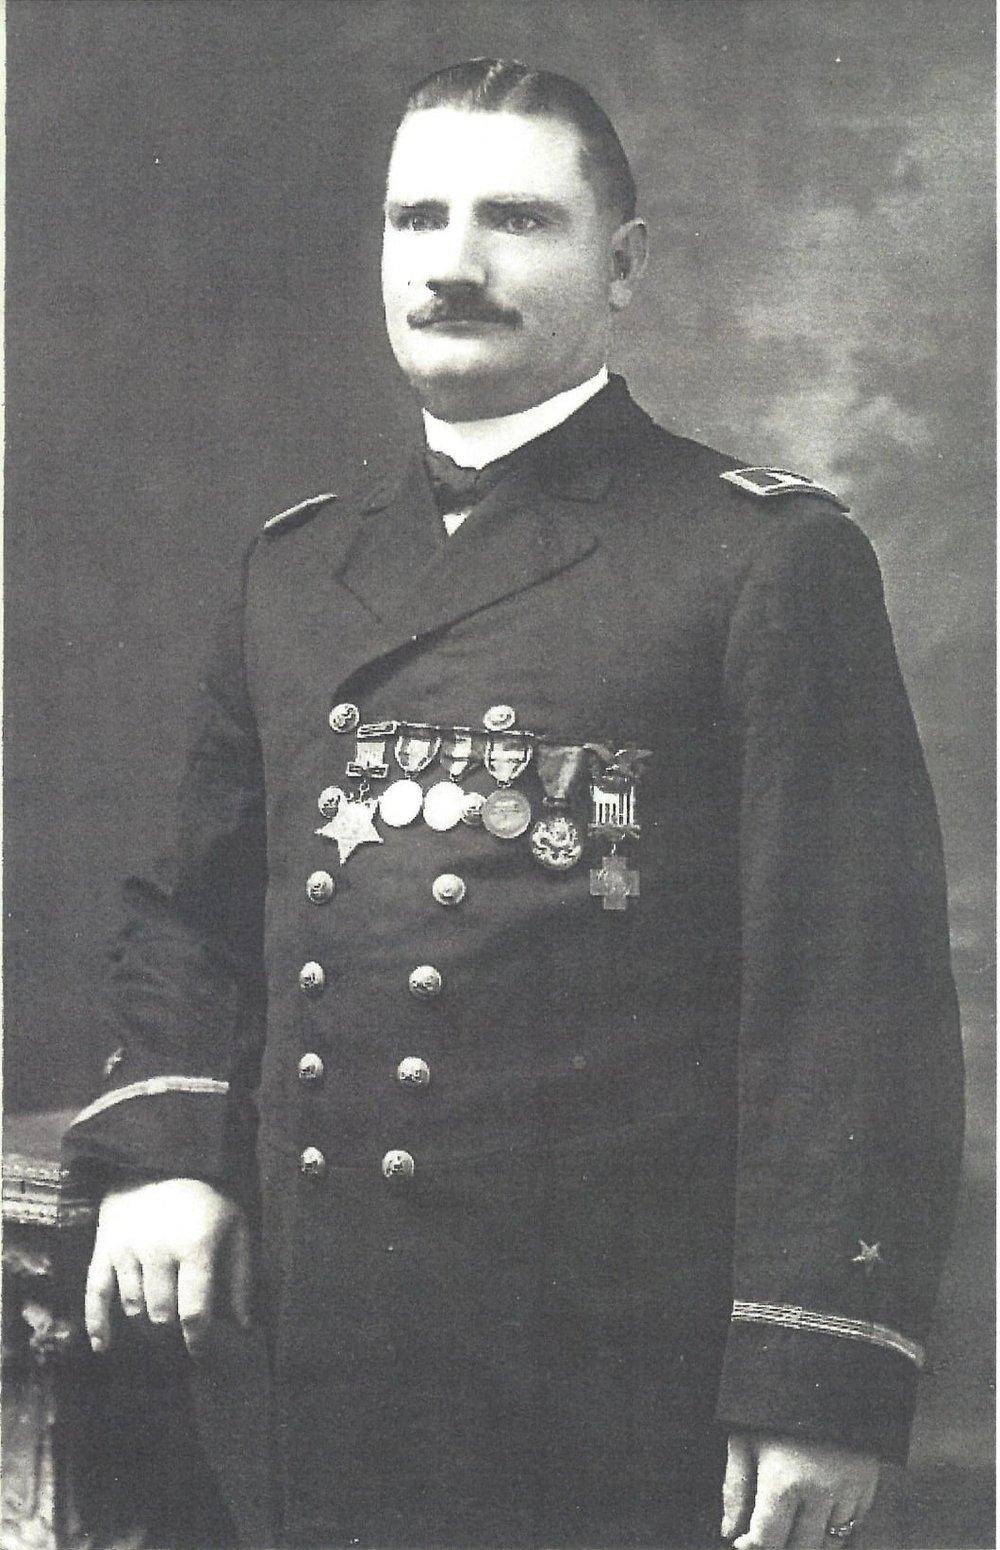 John McCloy circa 1900 (original photo held by Thomas Goff)